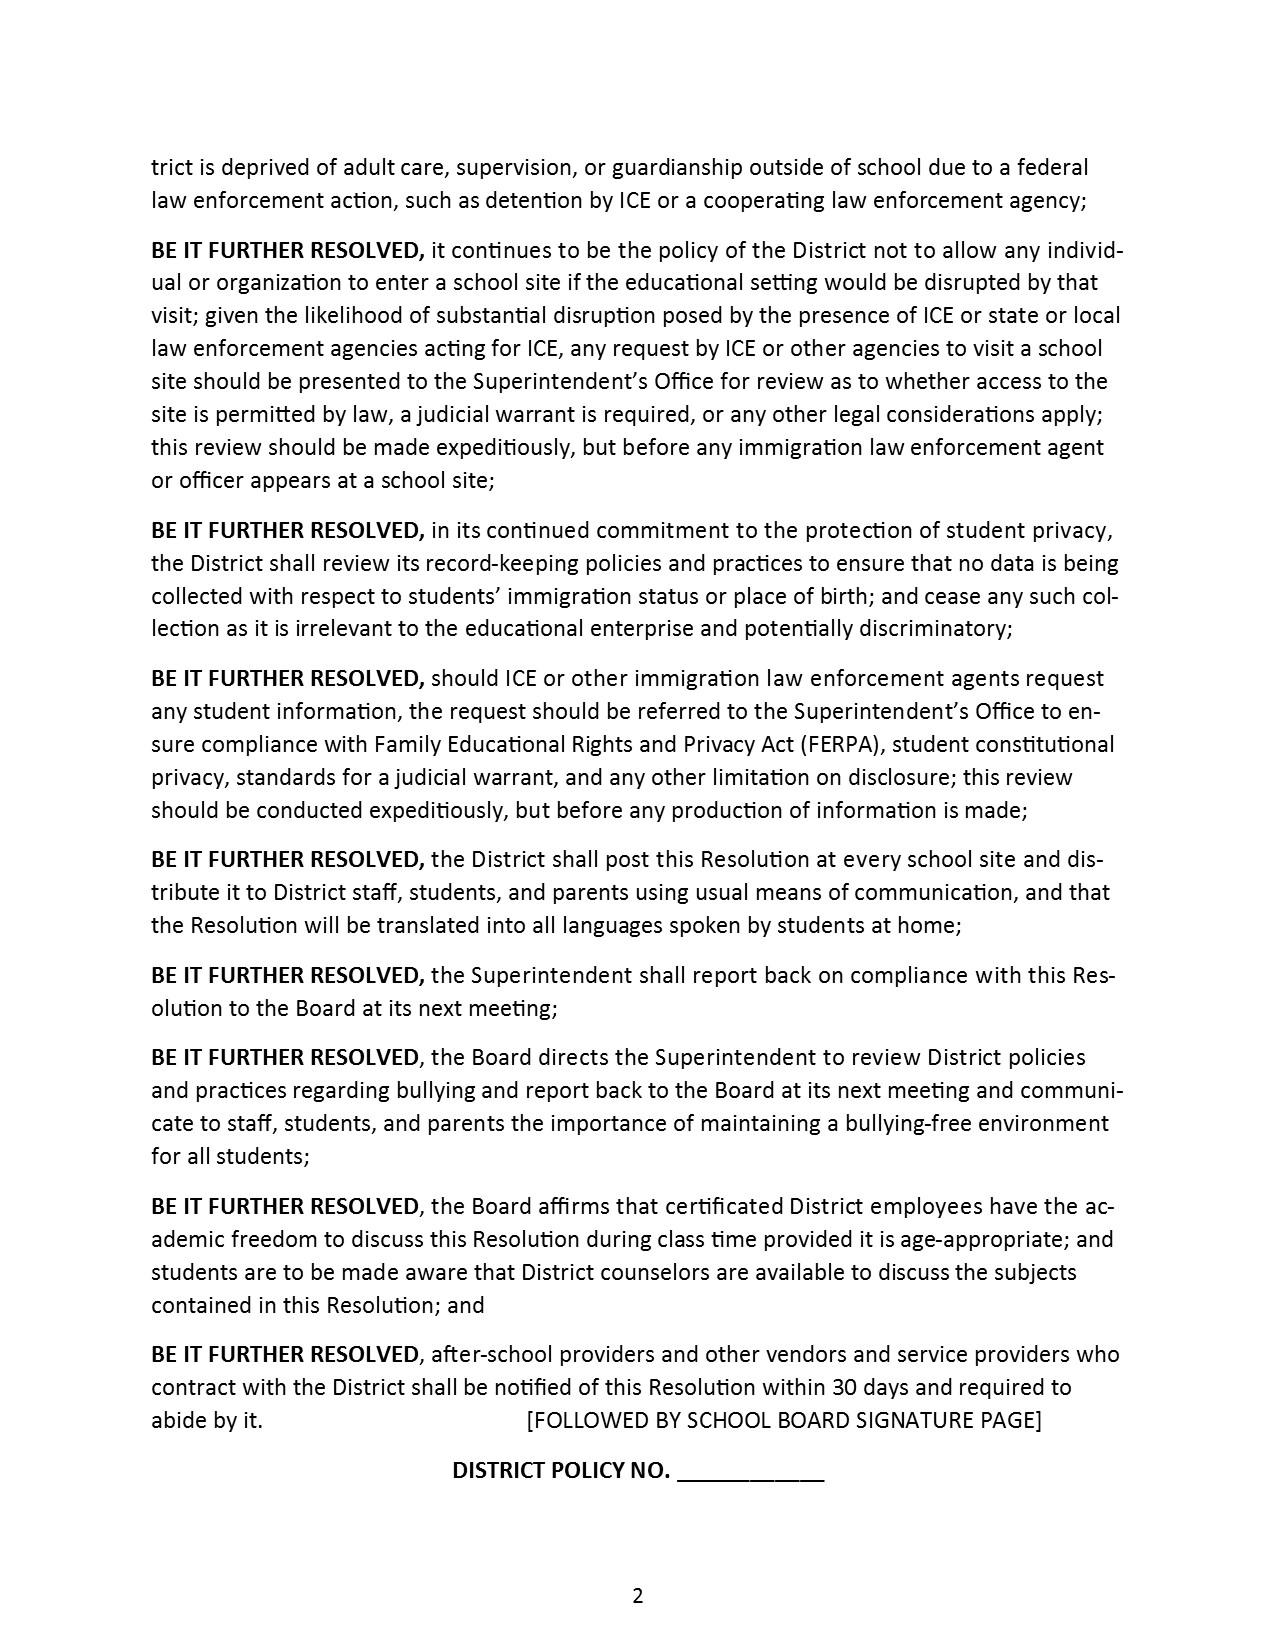 Resolution Page 2